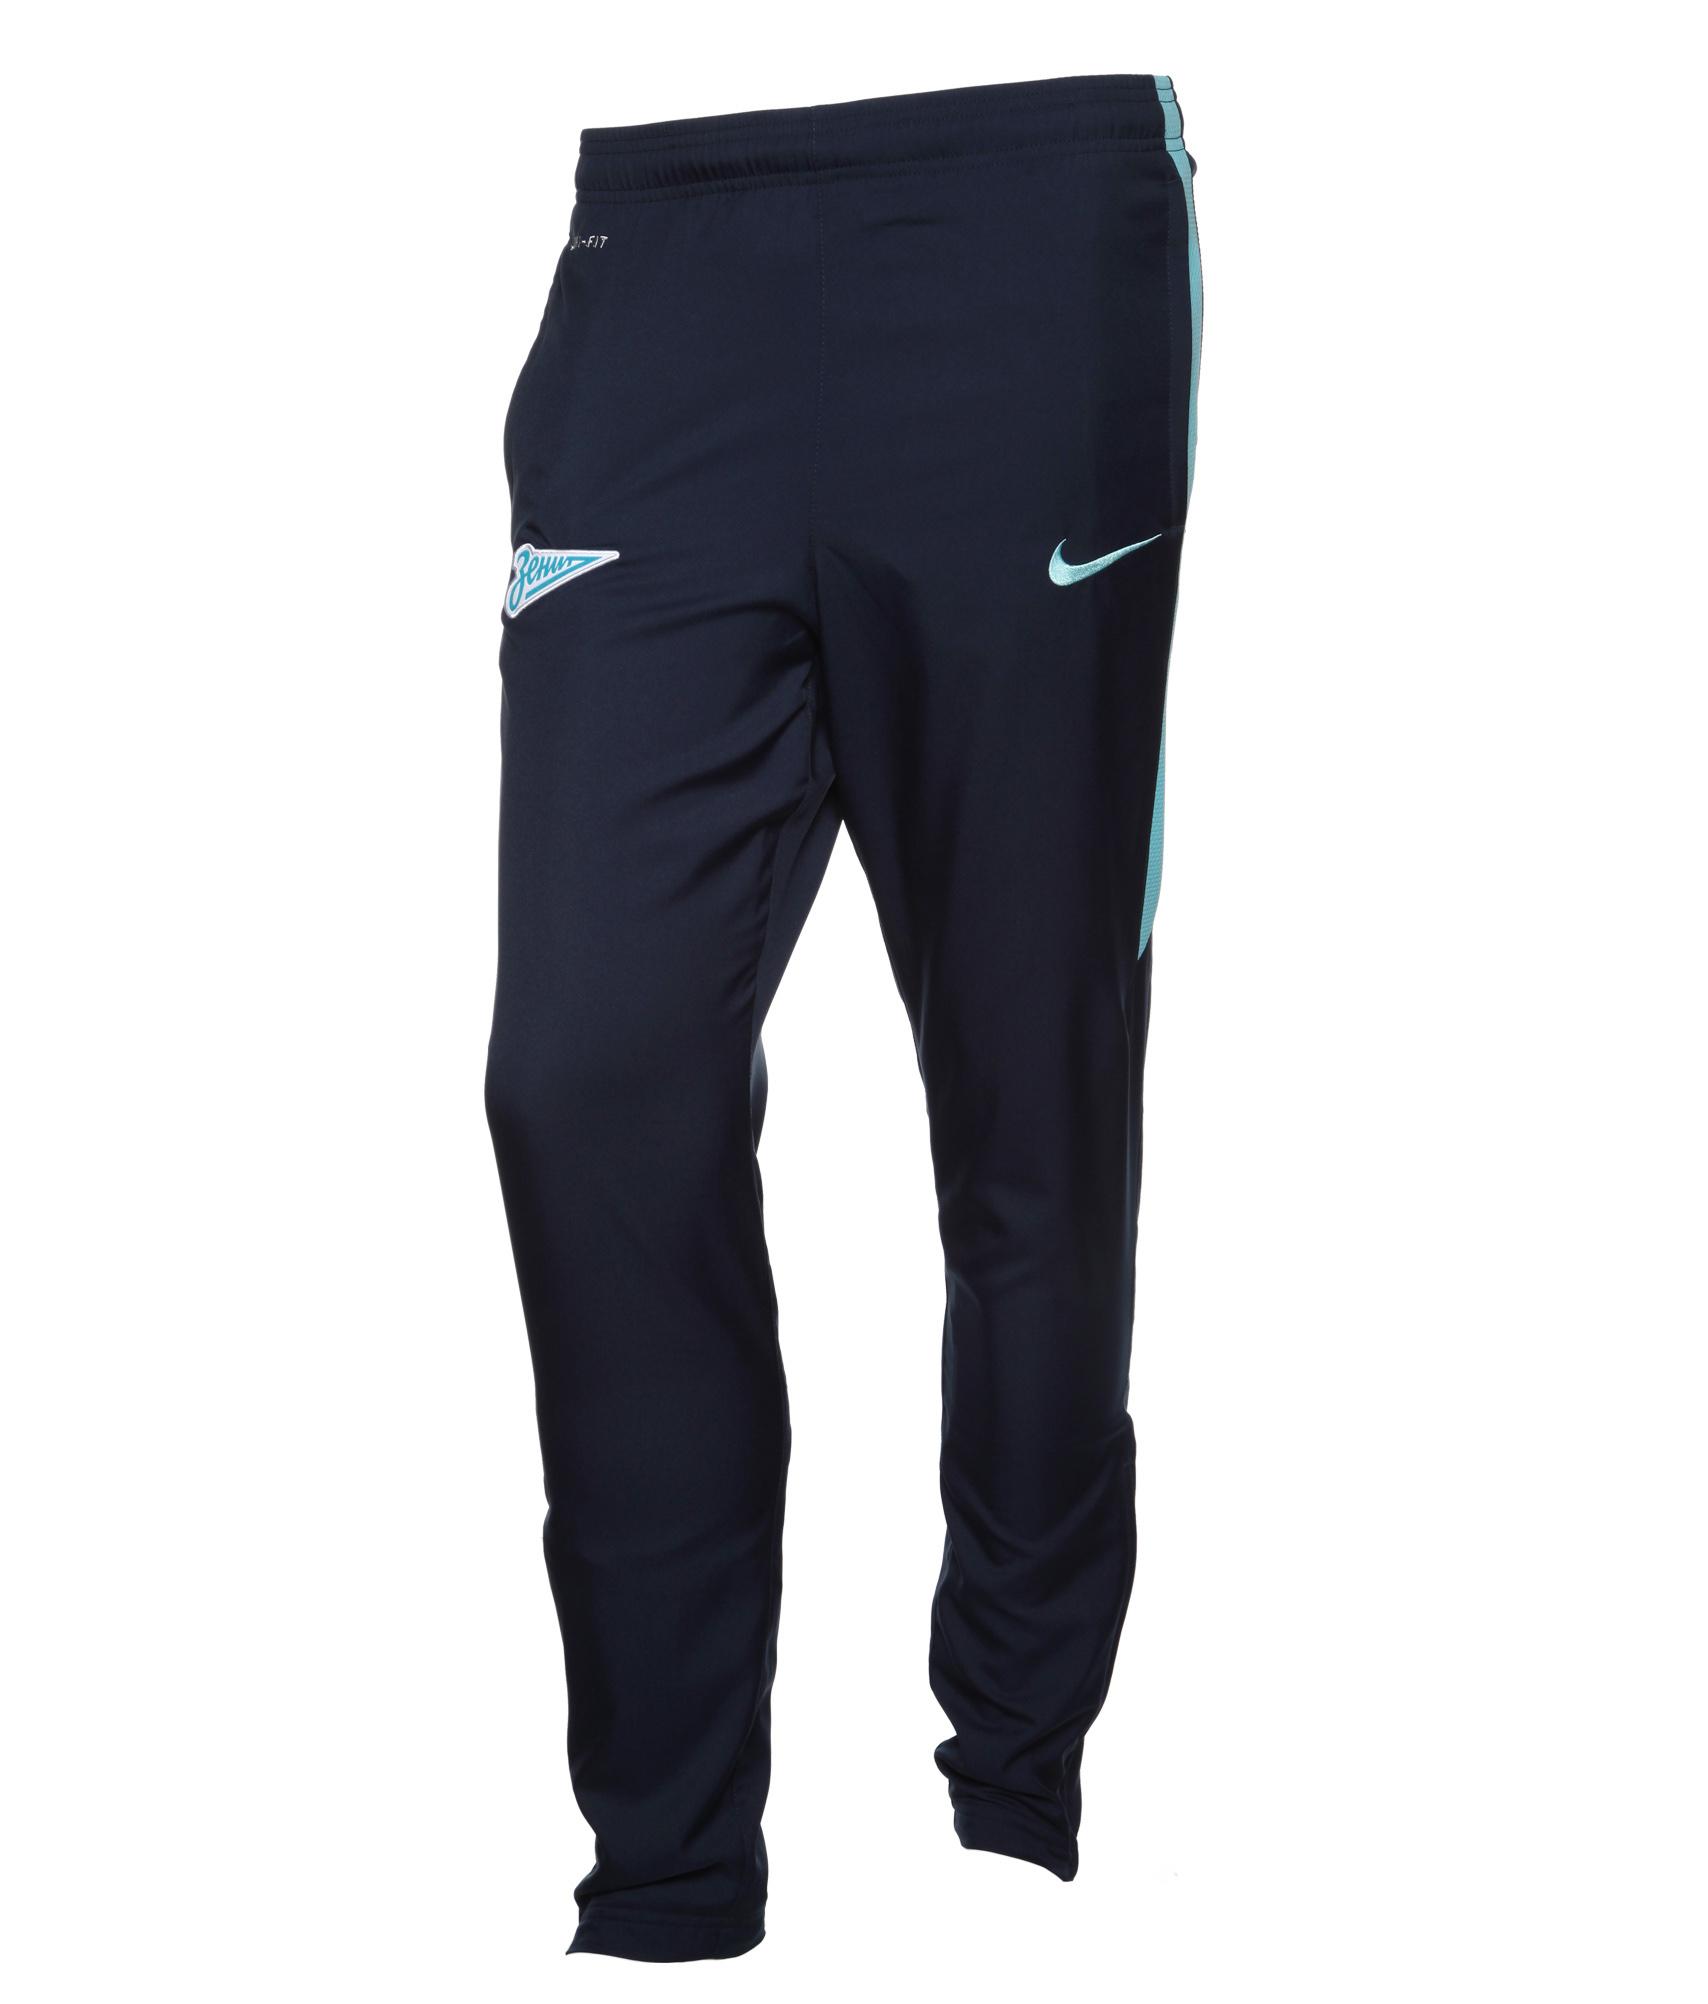 купить Брюки от костюма Nike ZENIT P REV WVN TRACK PNT, Цвет-Синий, Размер-S недорого